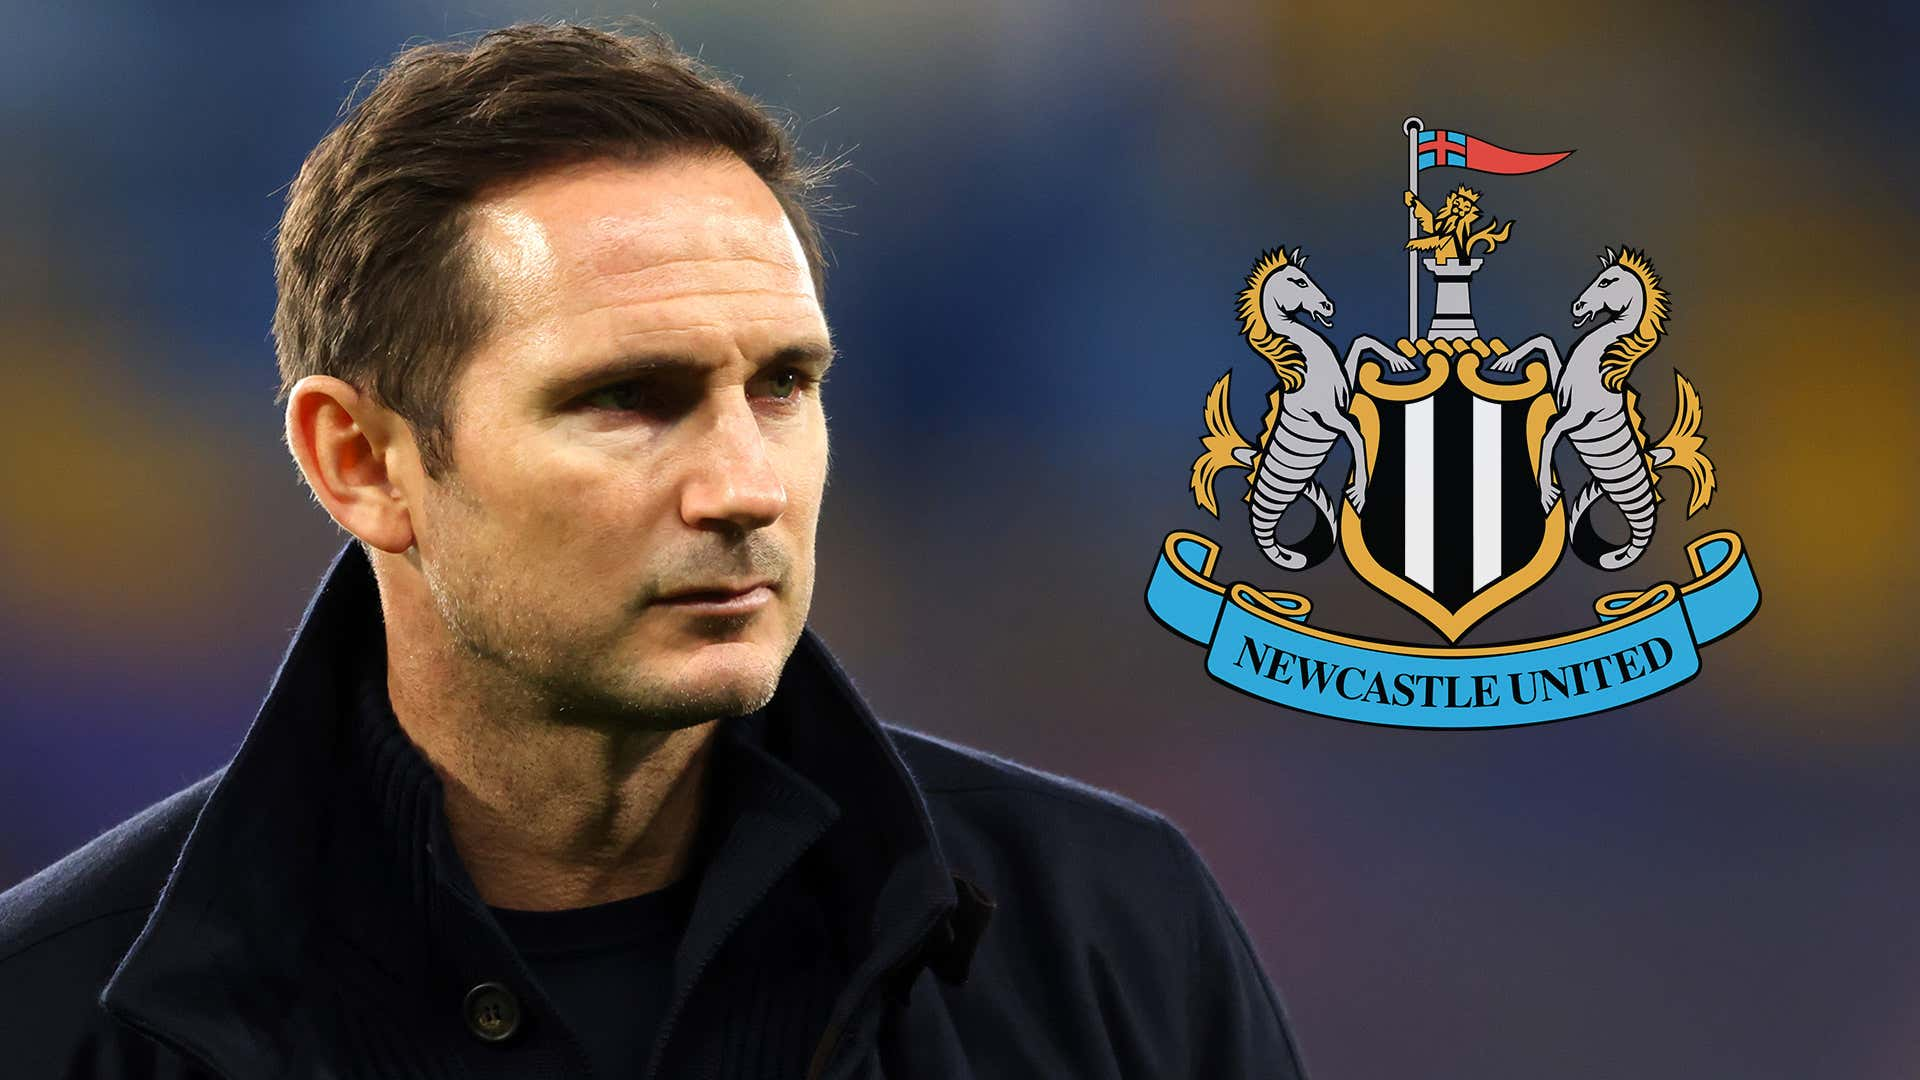 Frank Lampard sagt Newcastle offenbar ab, kommt nun Paulo Fonseca? | Goal.com